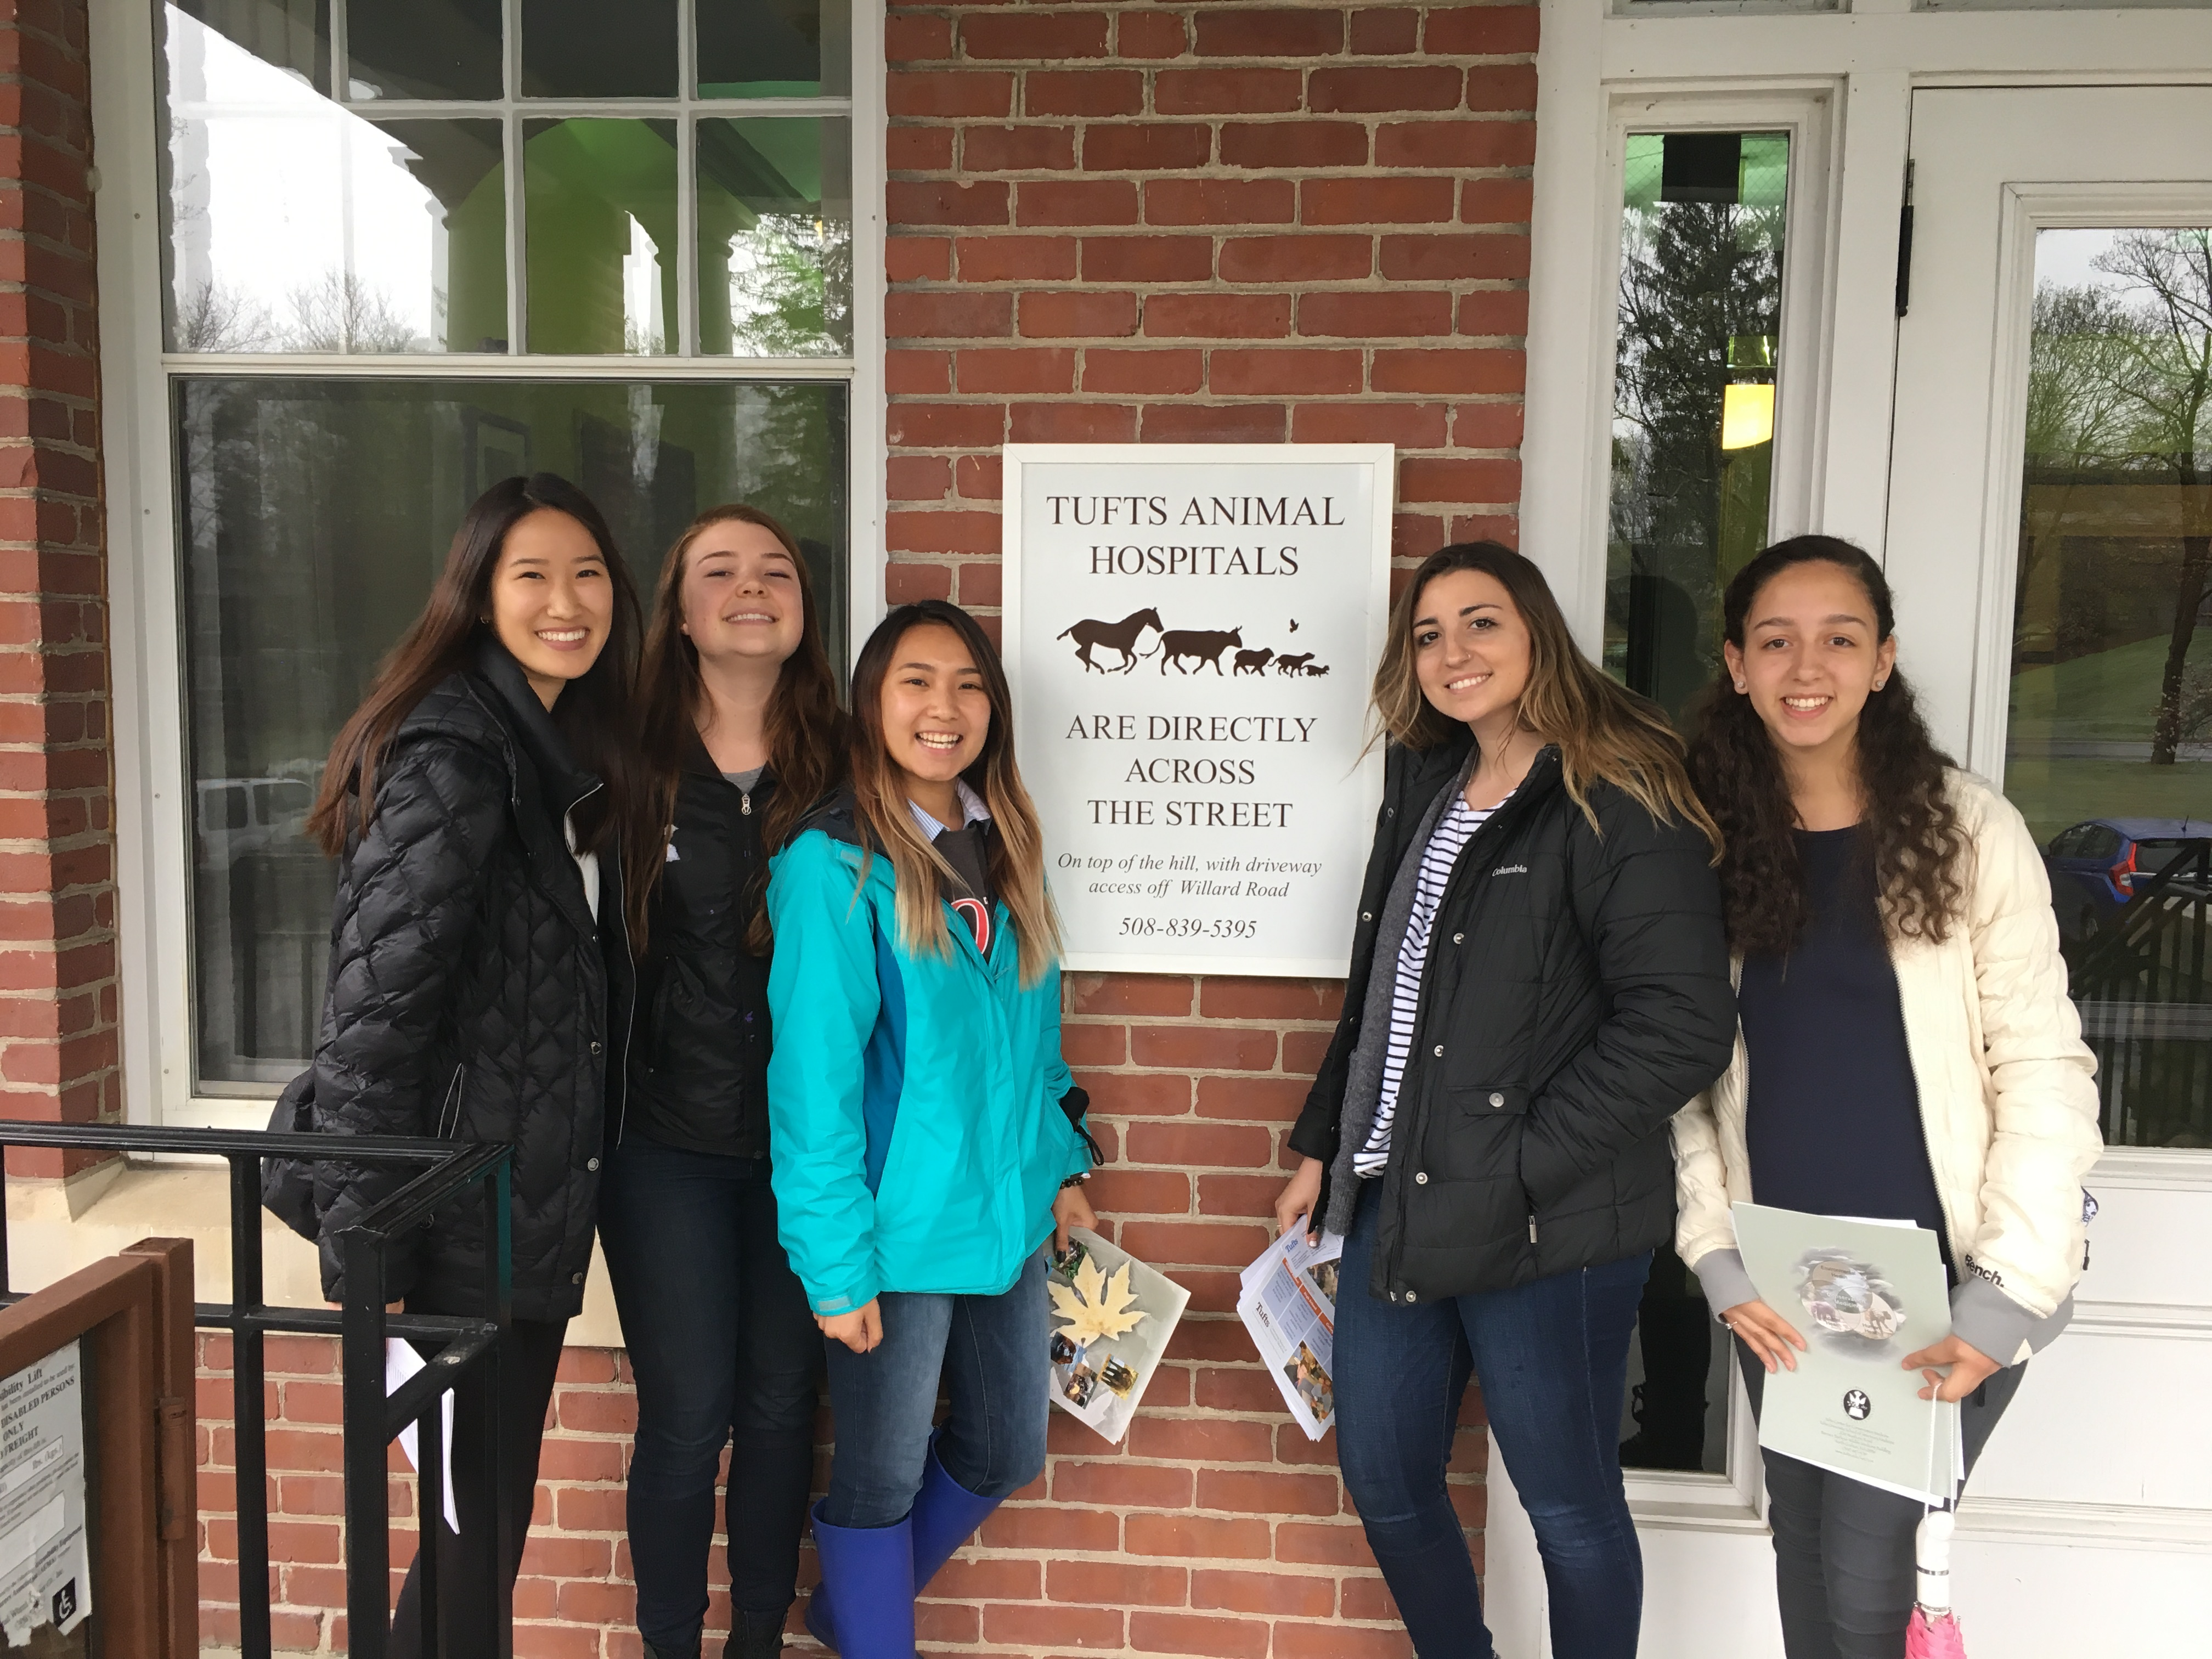 Brown University Pre-Veterinary Association – Brown University